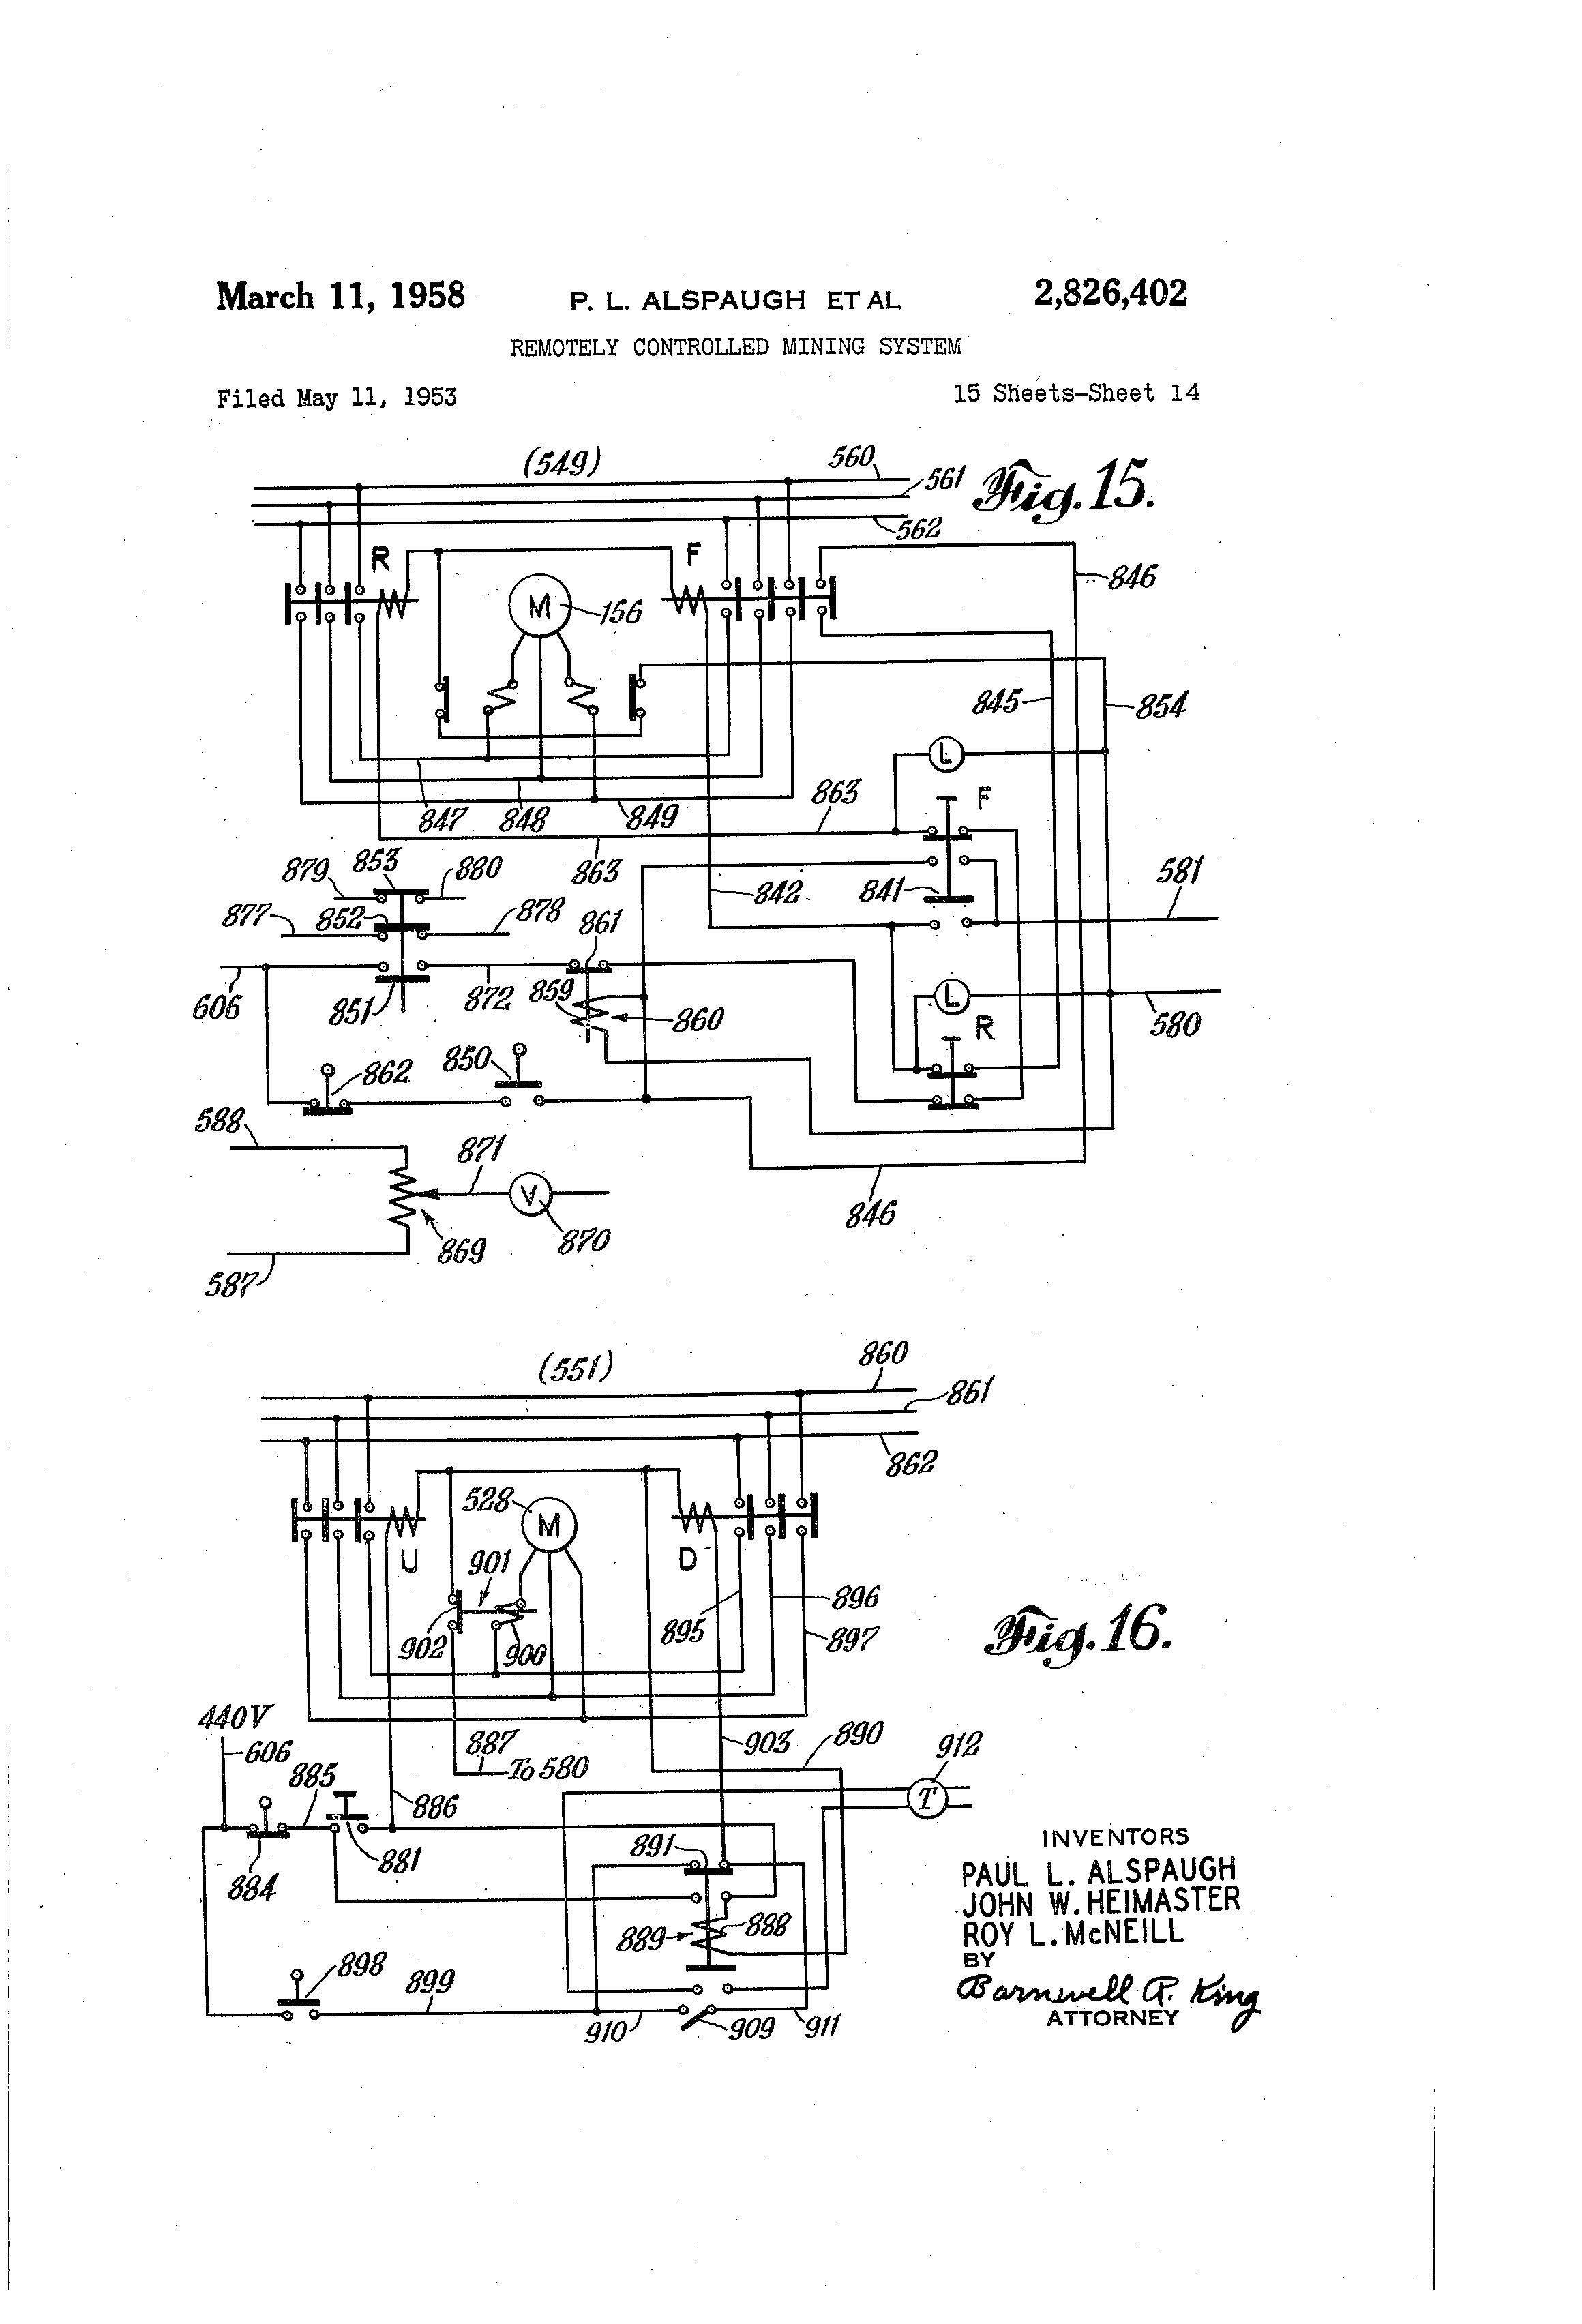 wiring diagram cat 563 roller - wiring diagram cat 563 roller with,Wiring diagram,Wiring Diagram Cat 563 Roller